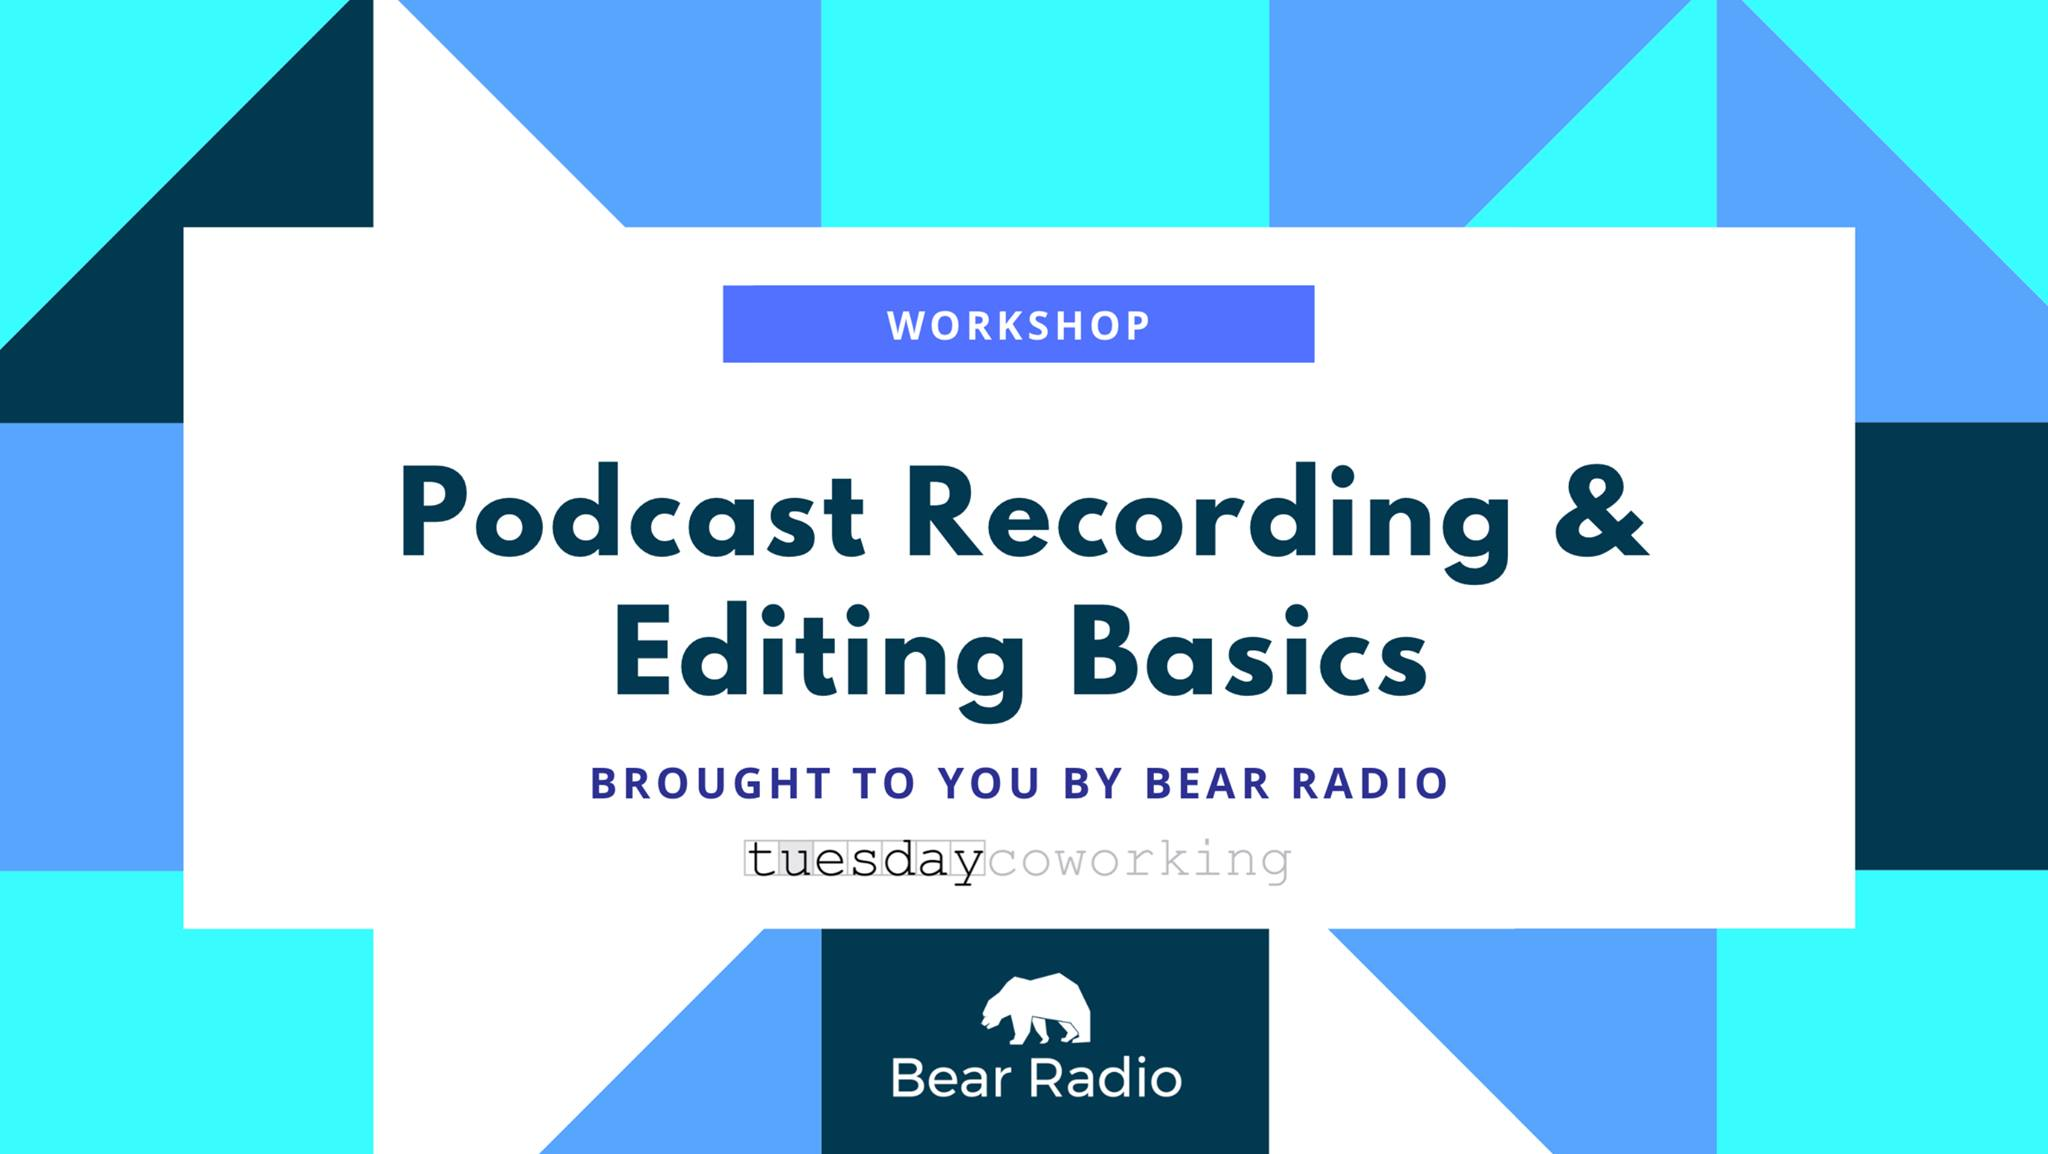 Podcast Recording image